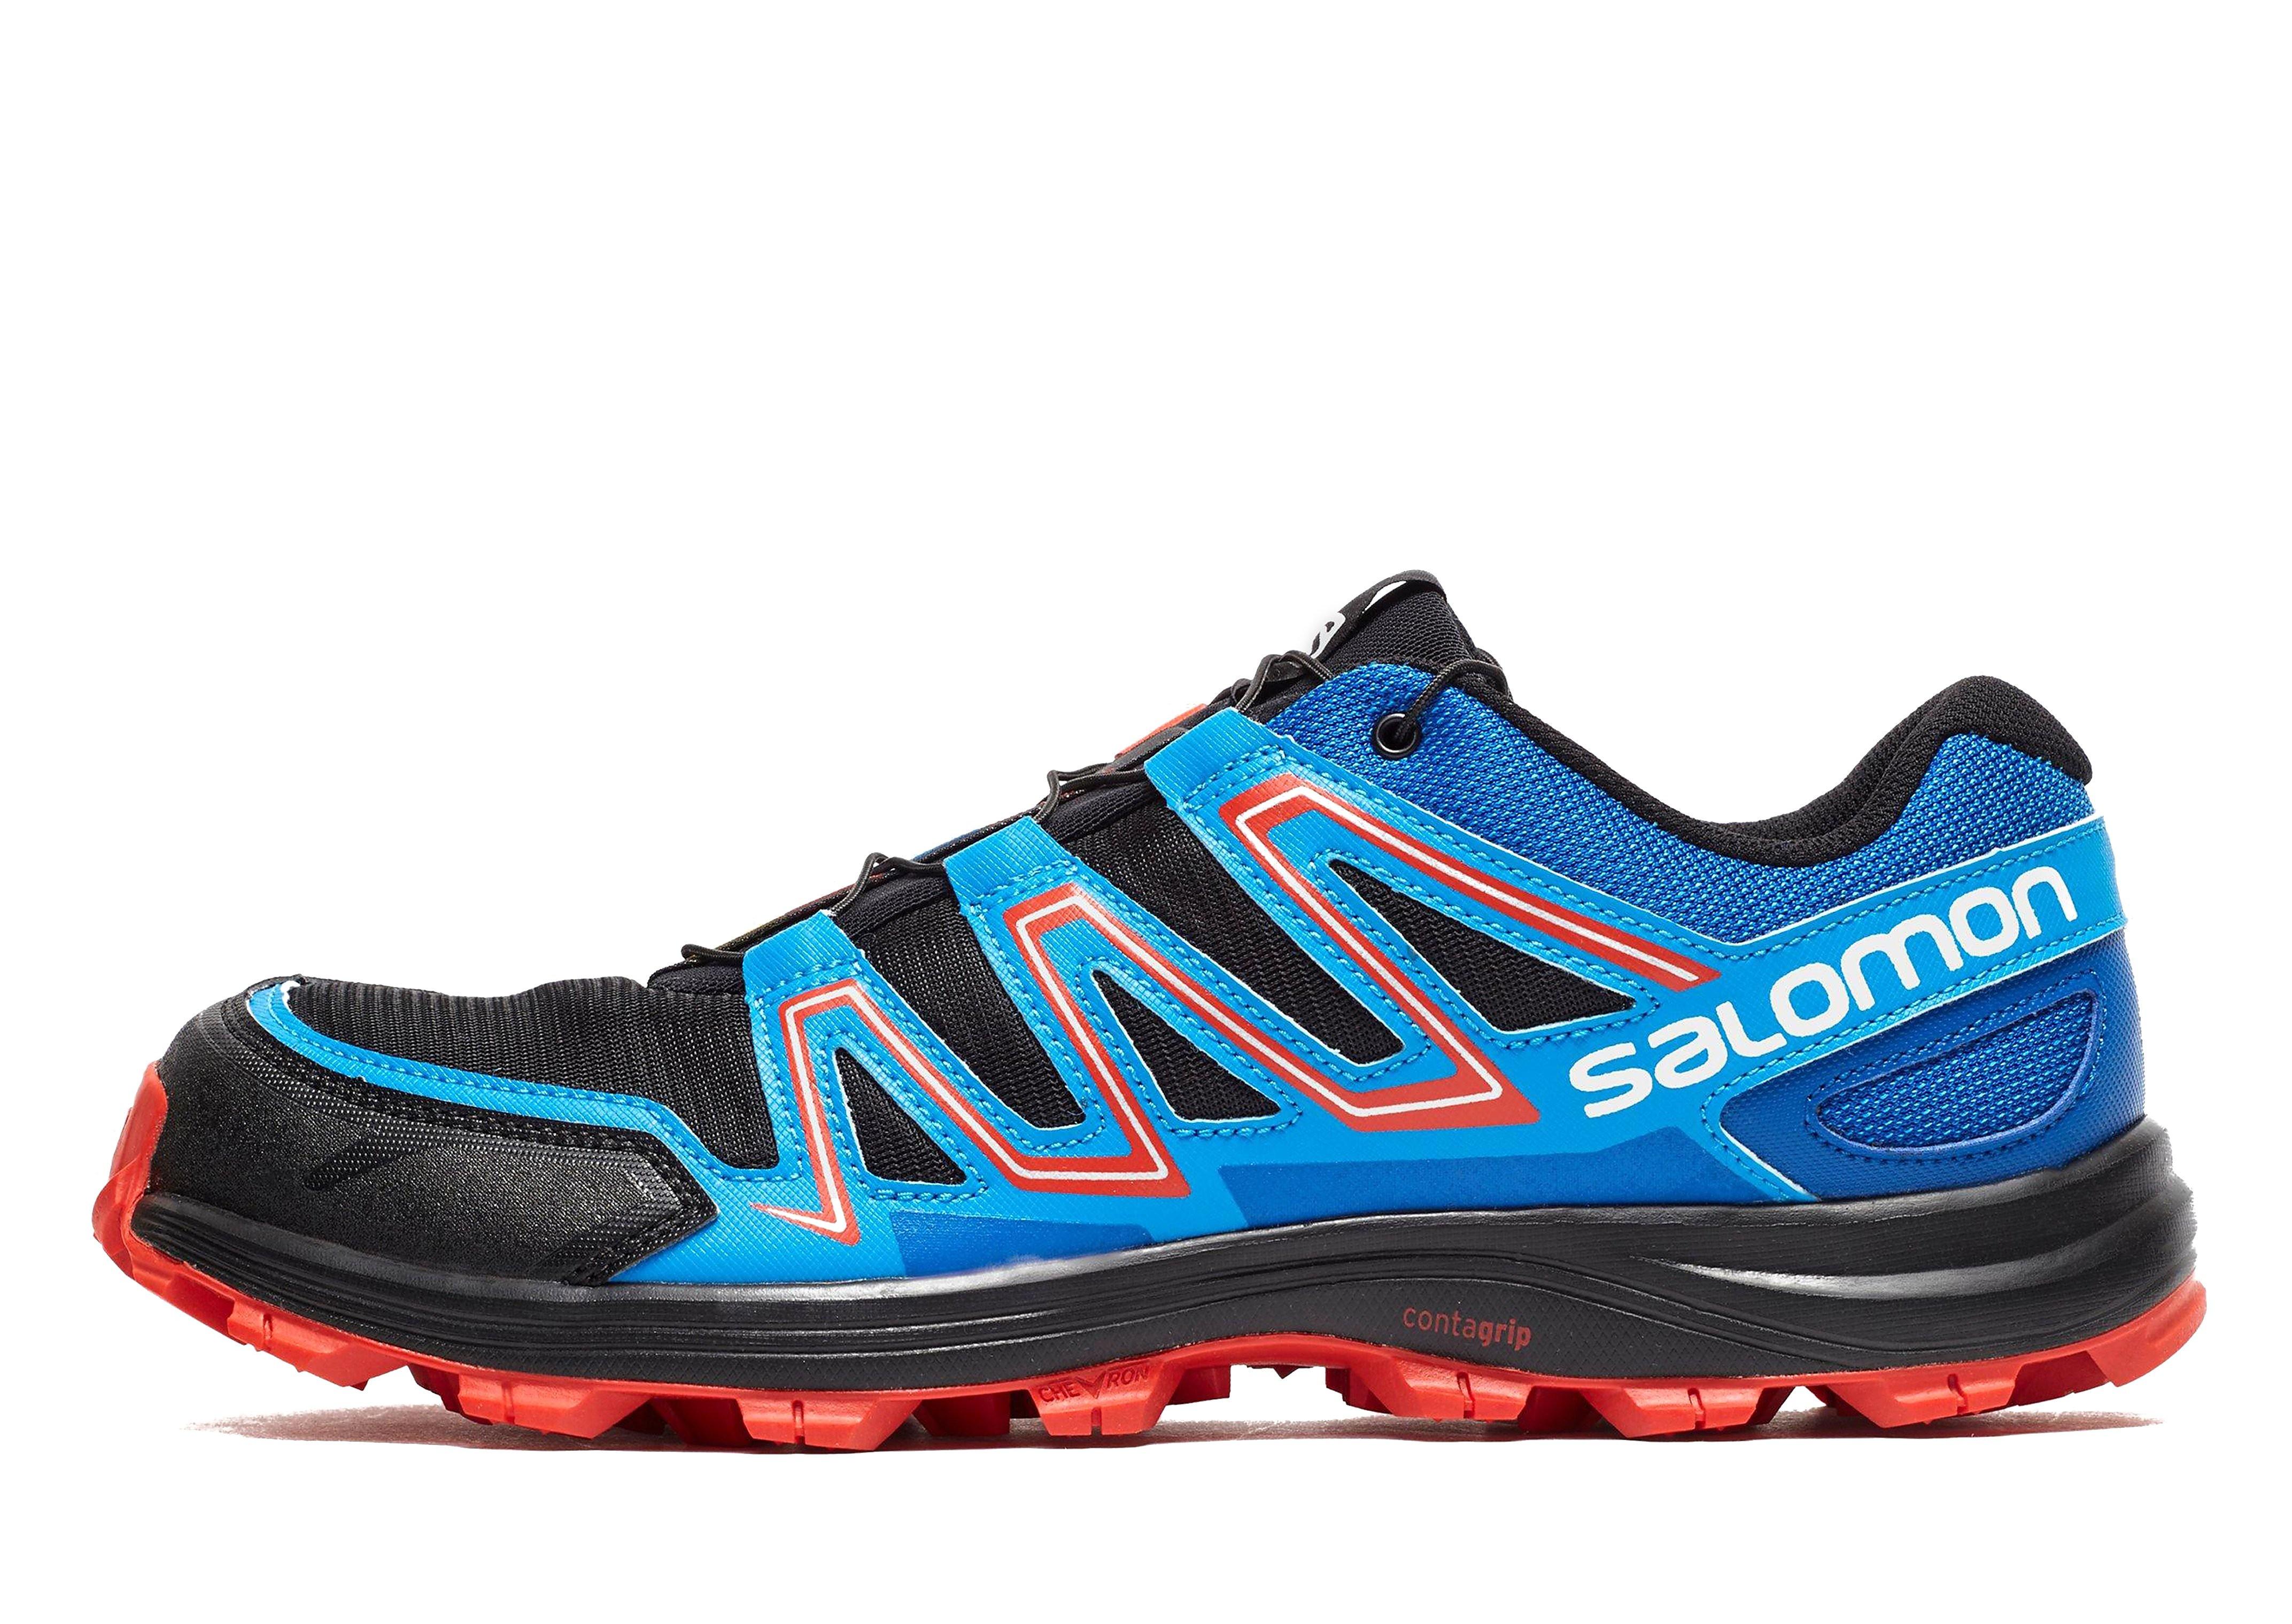 Salomon Speedtrak Trail